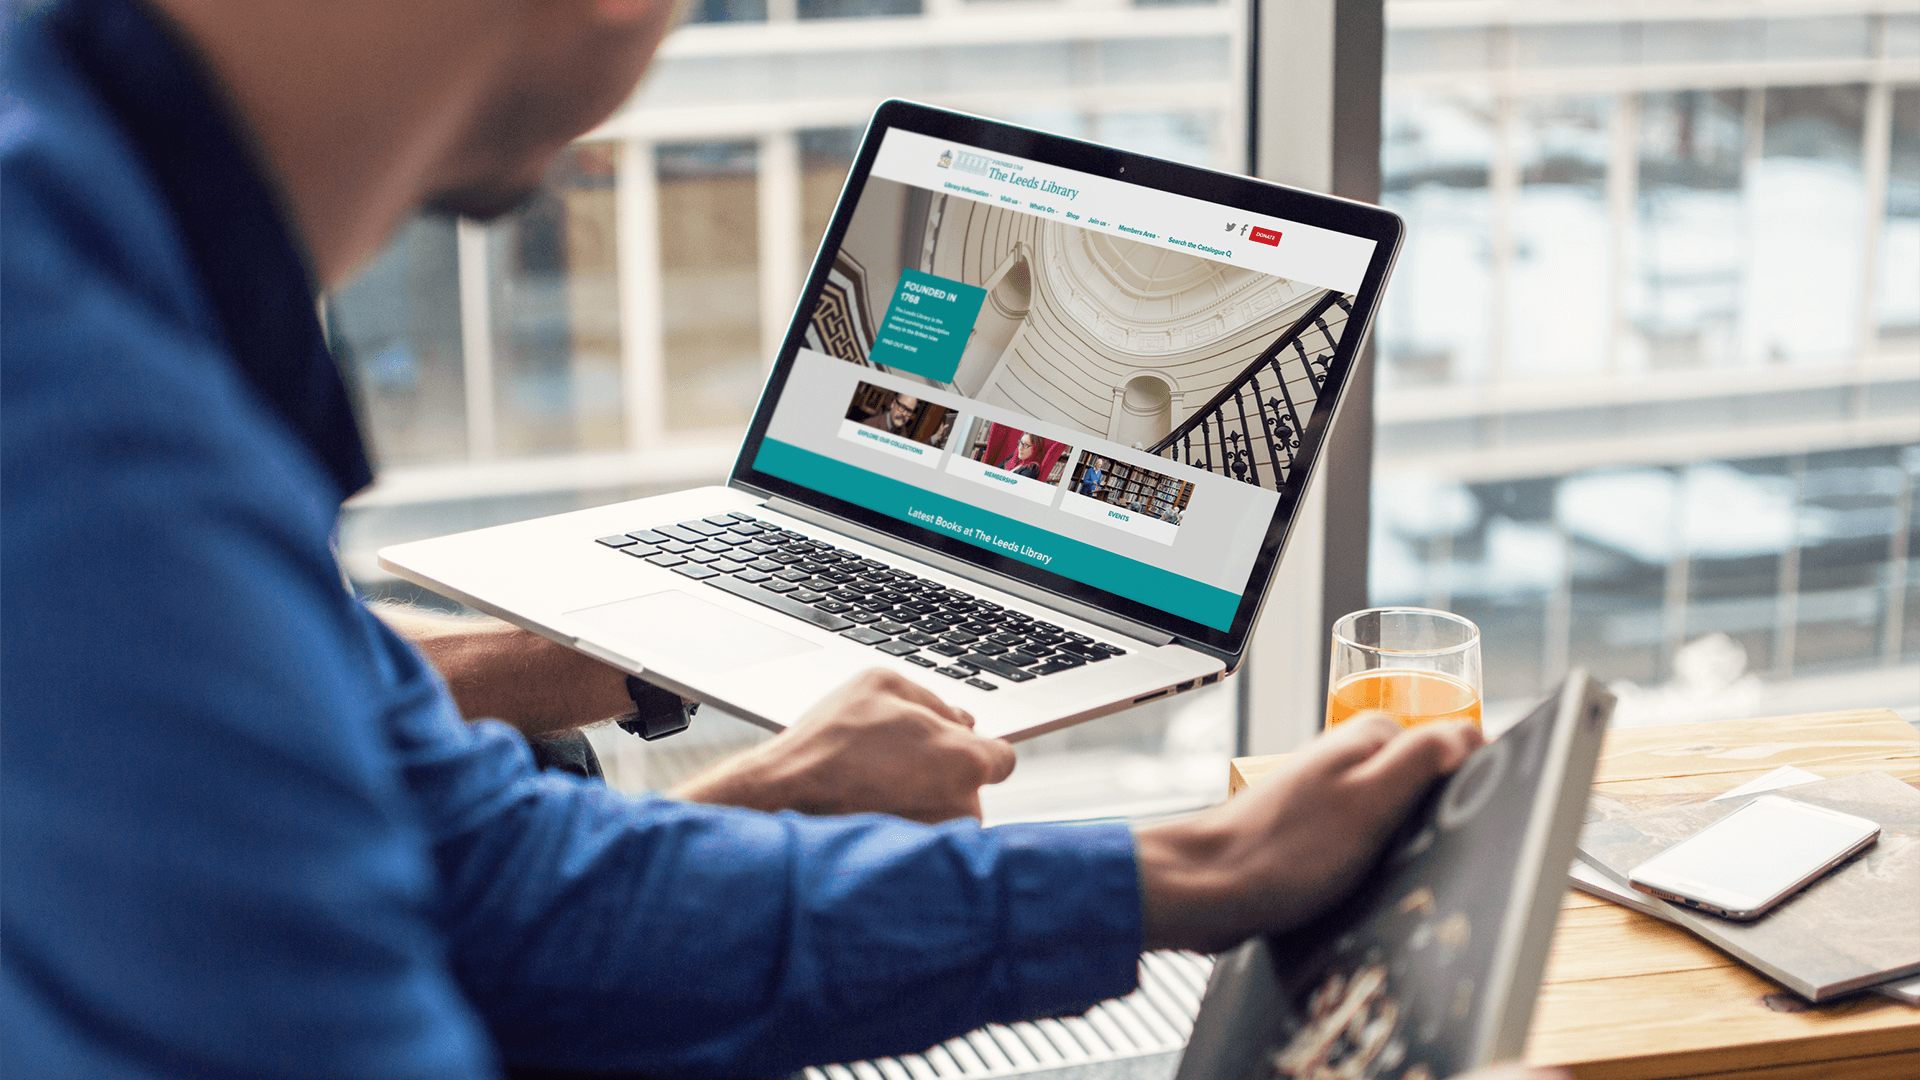 eecreative - building digital futures